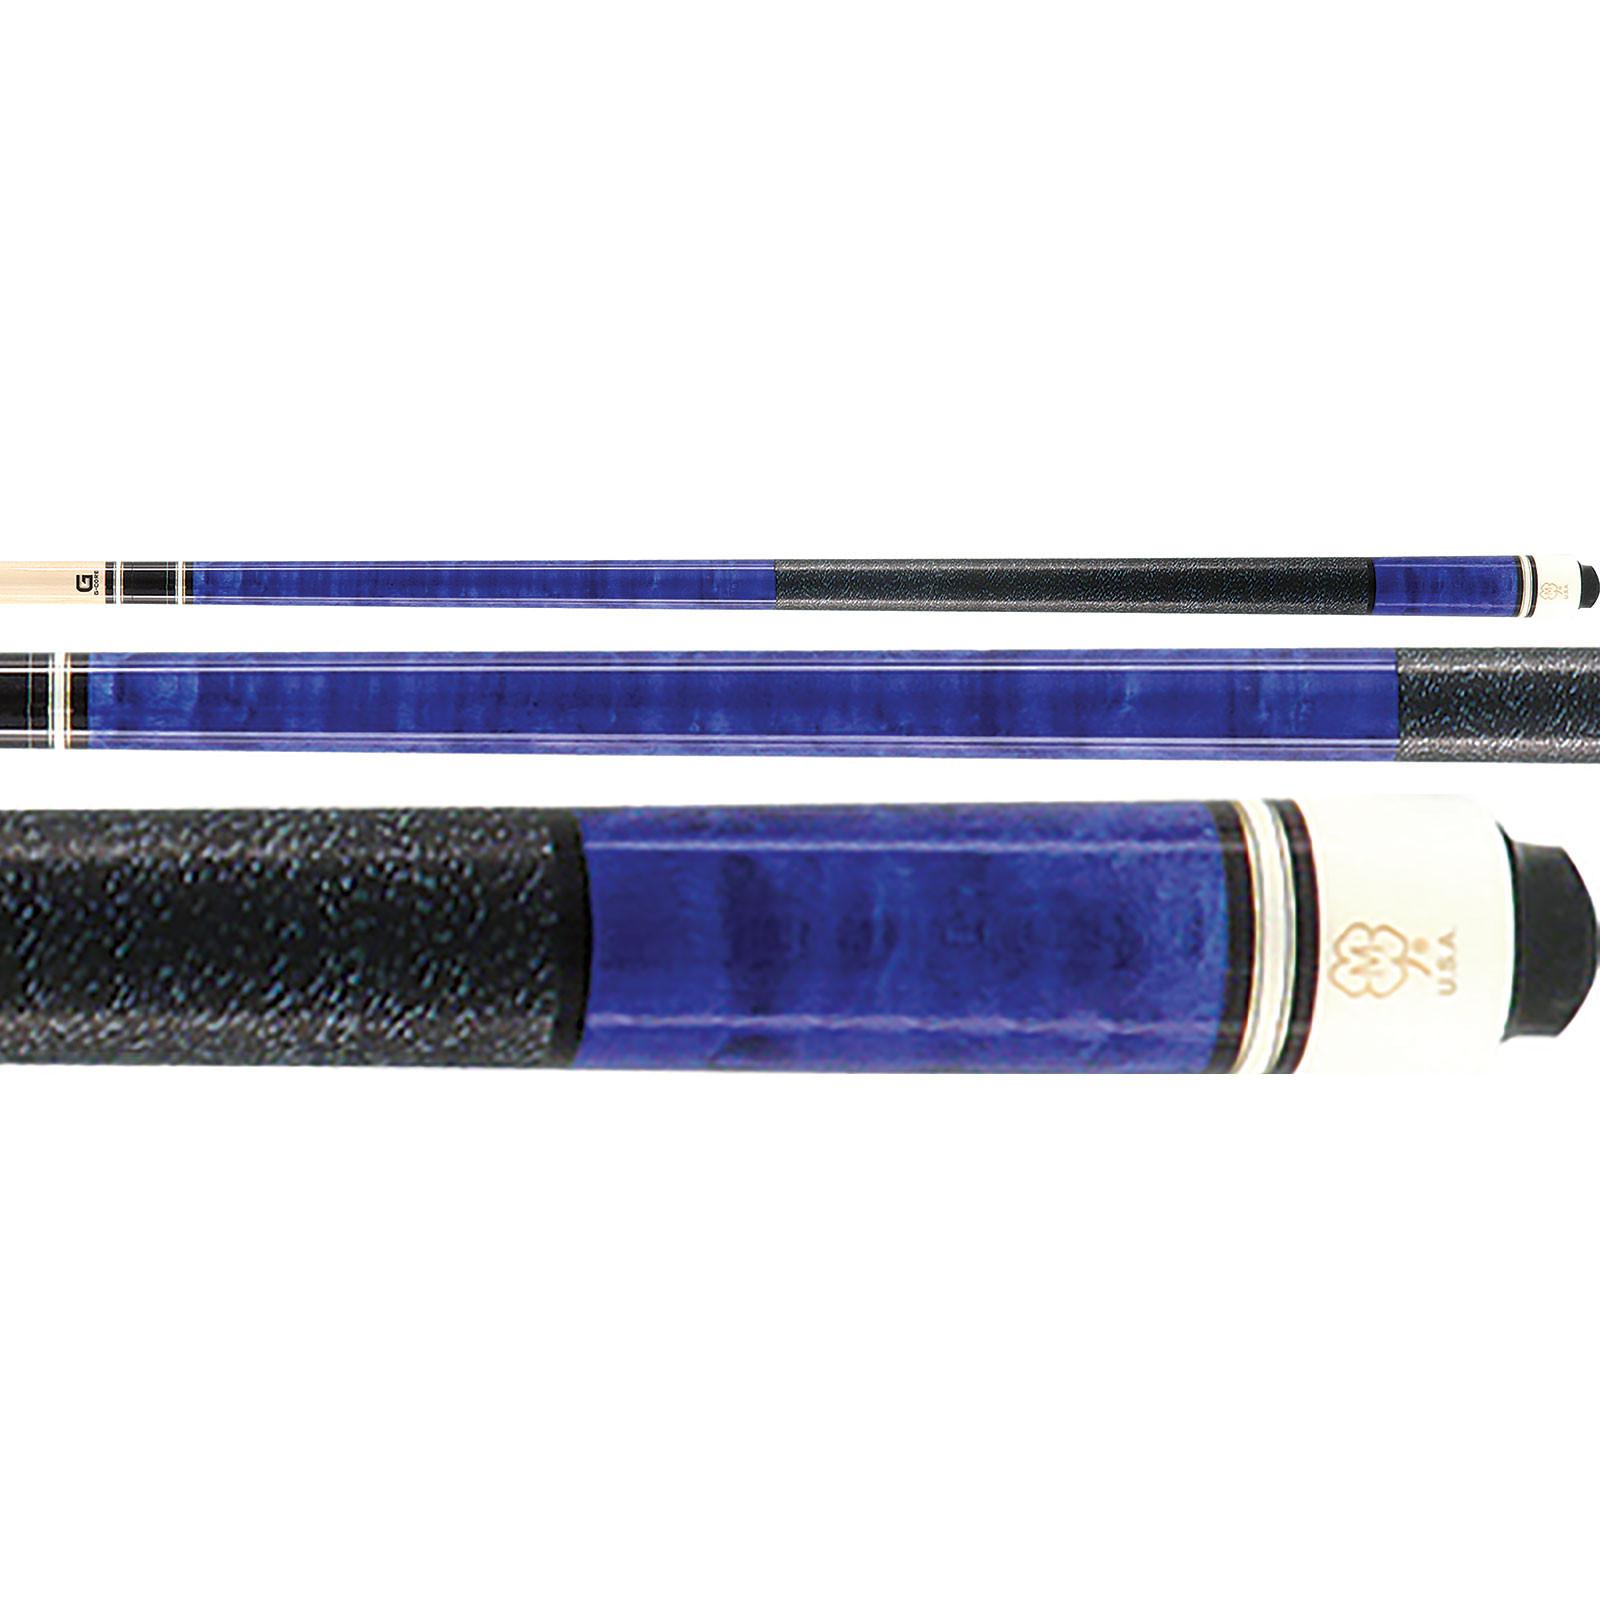 McDermott G201 Blue Pool Cue